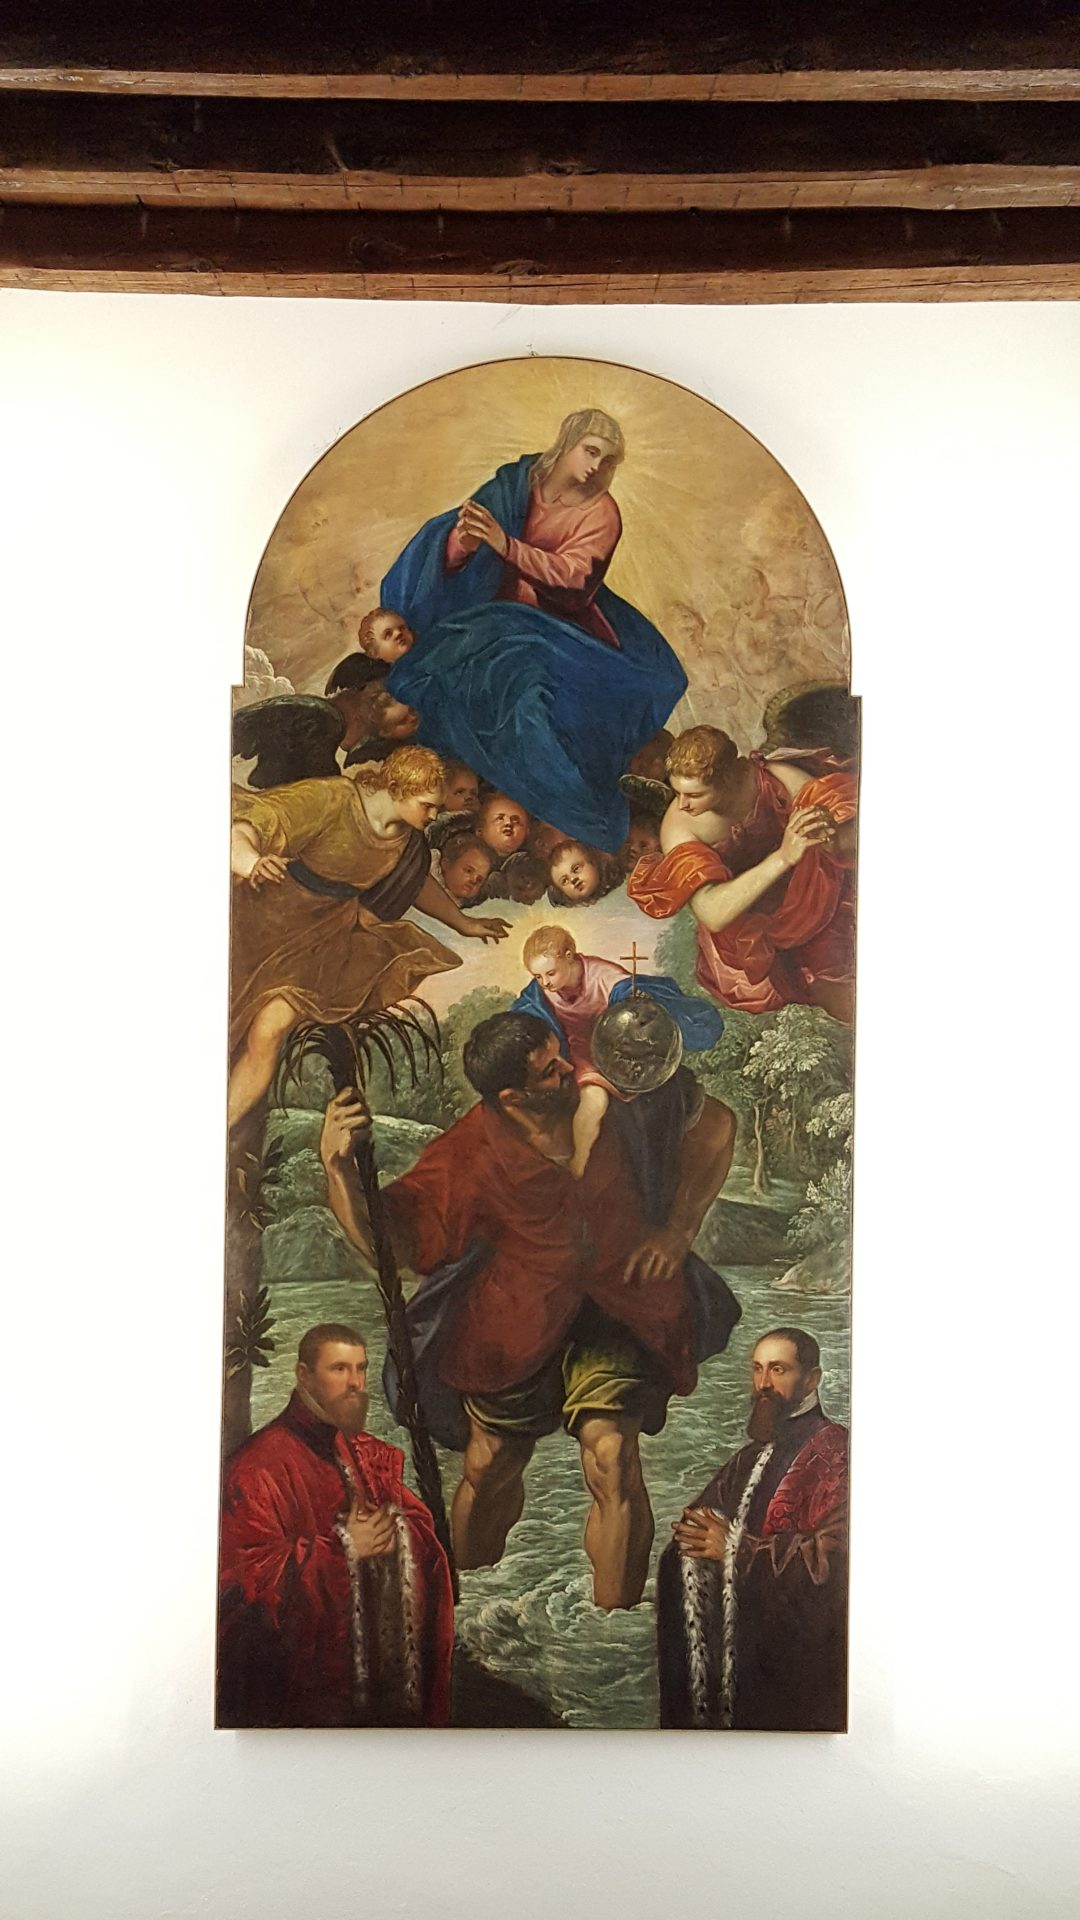 tintoretto alzano museo arte sacra